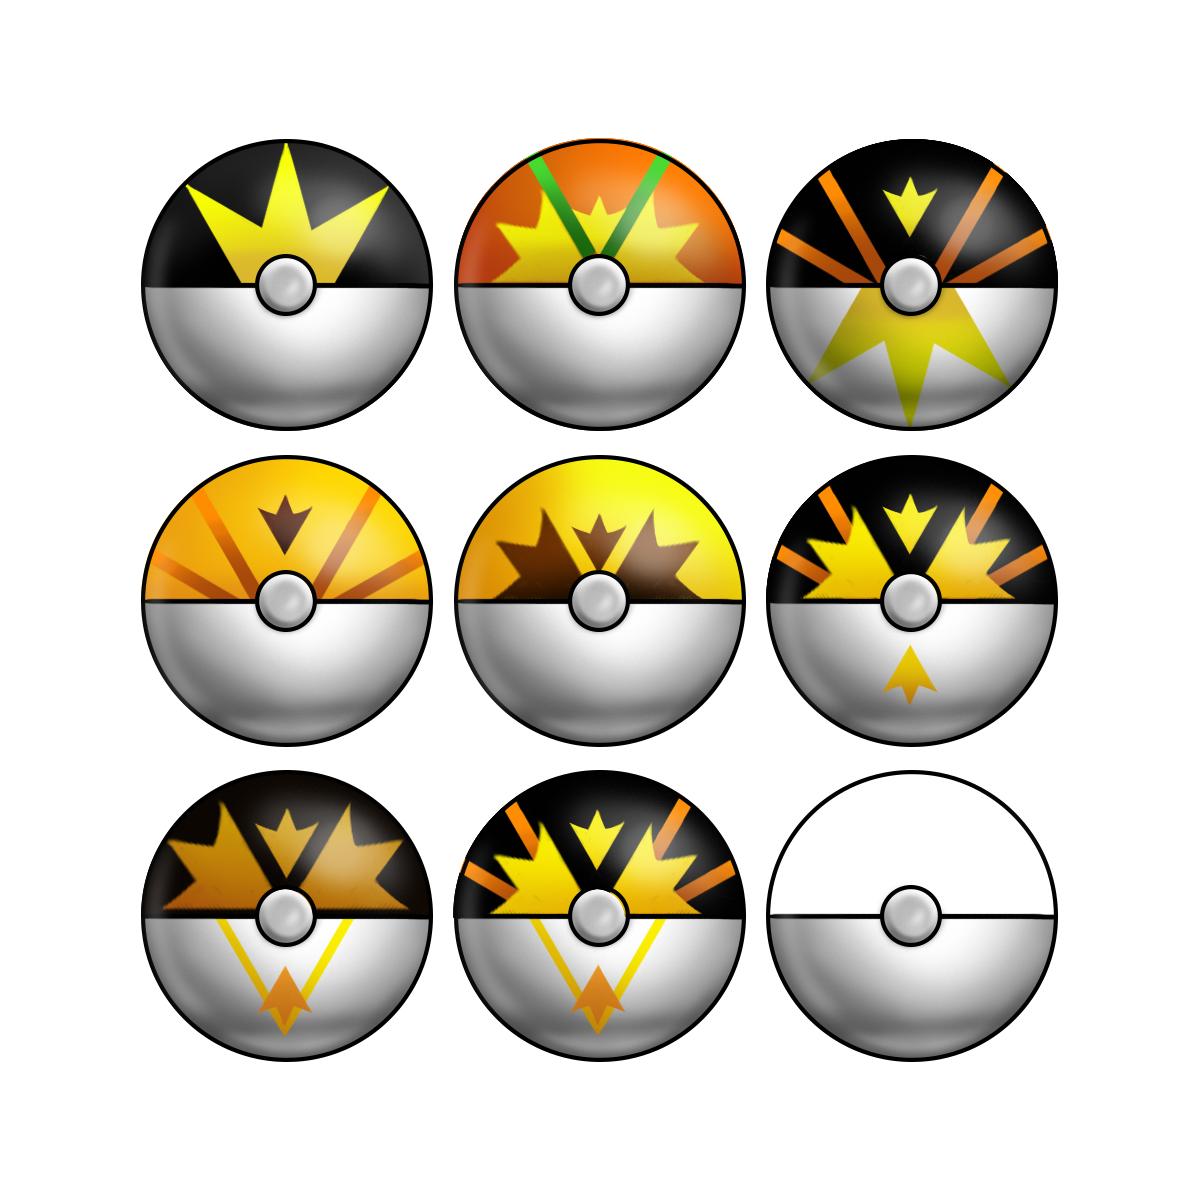 Pokémon Go Pokéball Designs On Behance